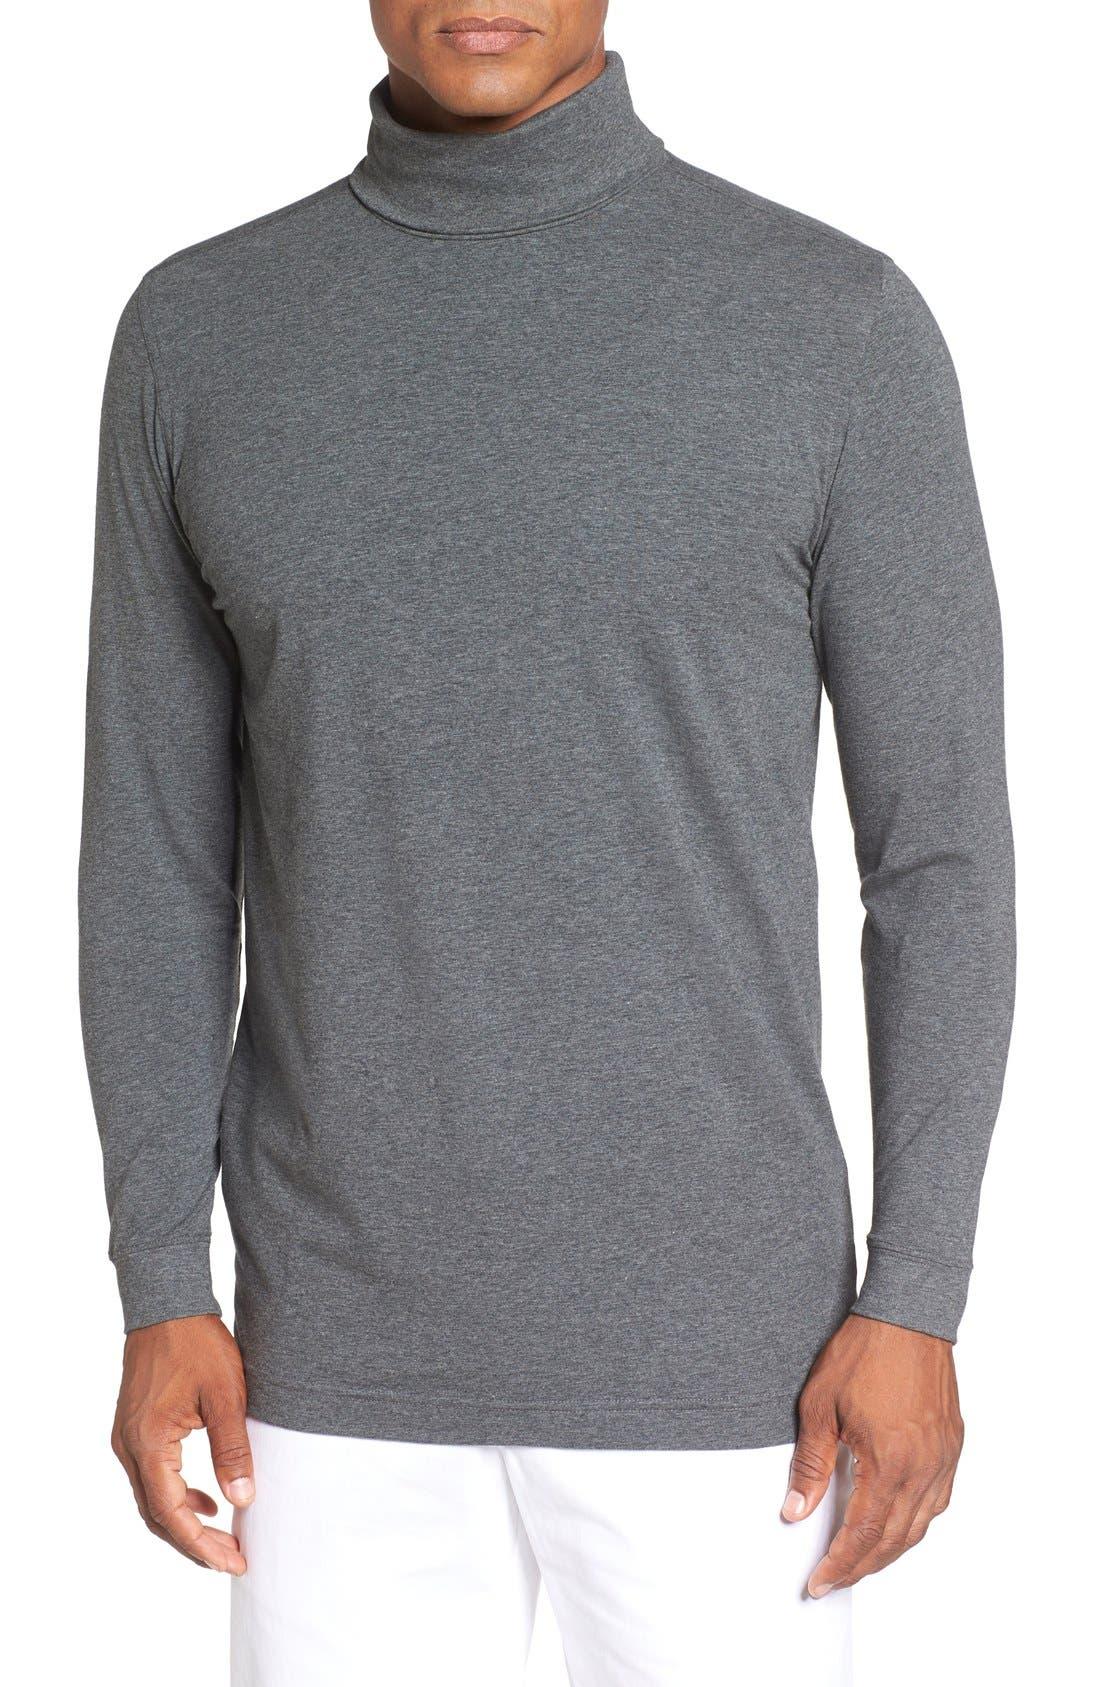 Main Image - Bobby Jones Long Sleeve Turtleneck T-Shirt